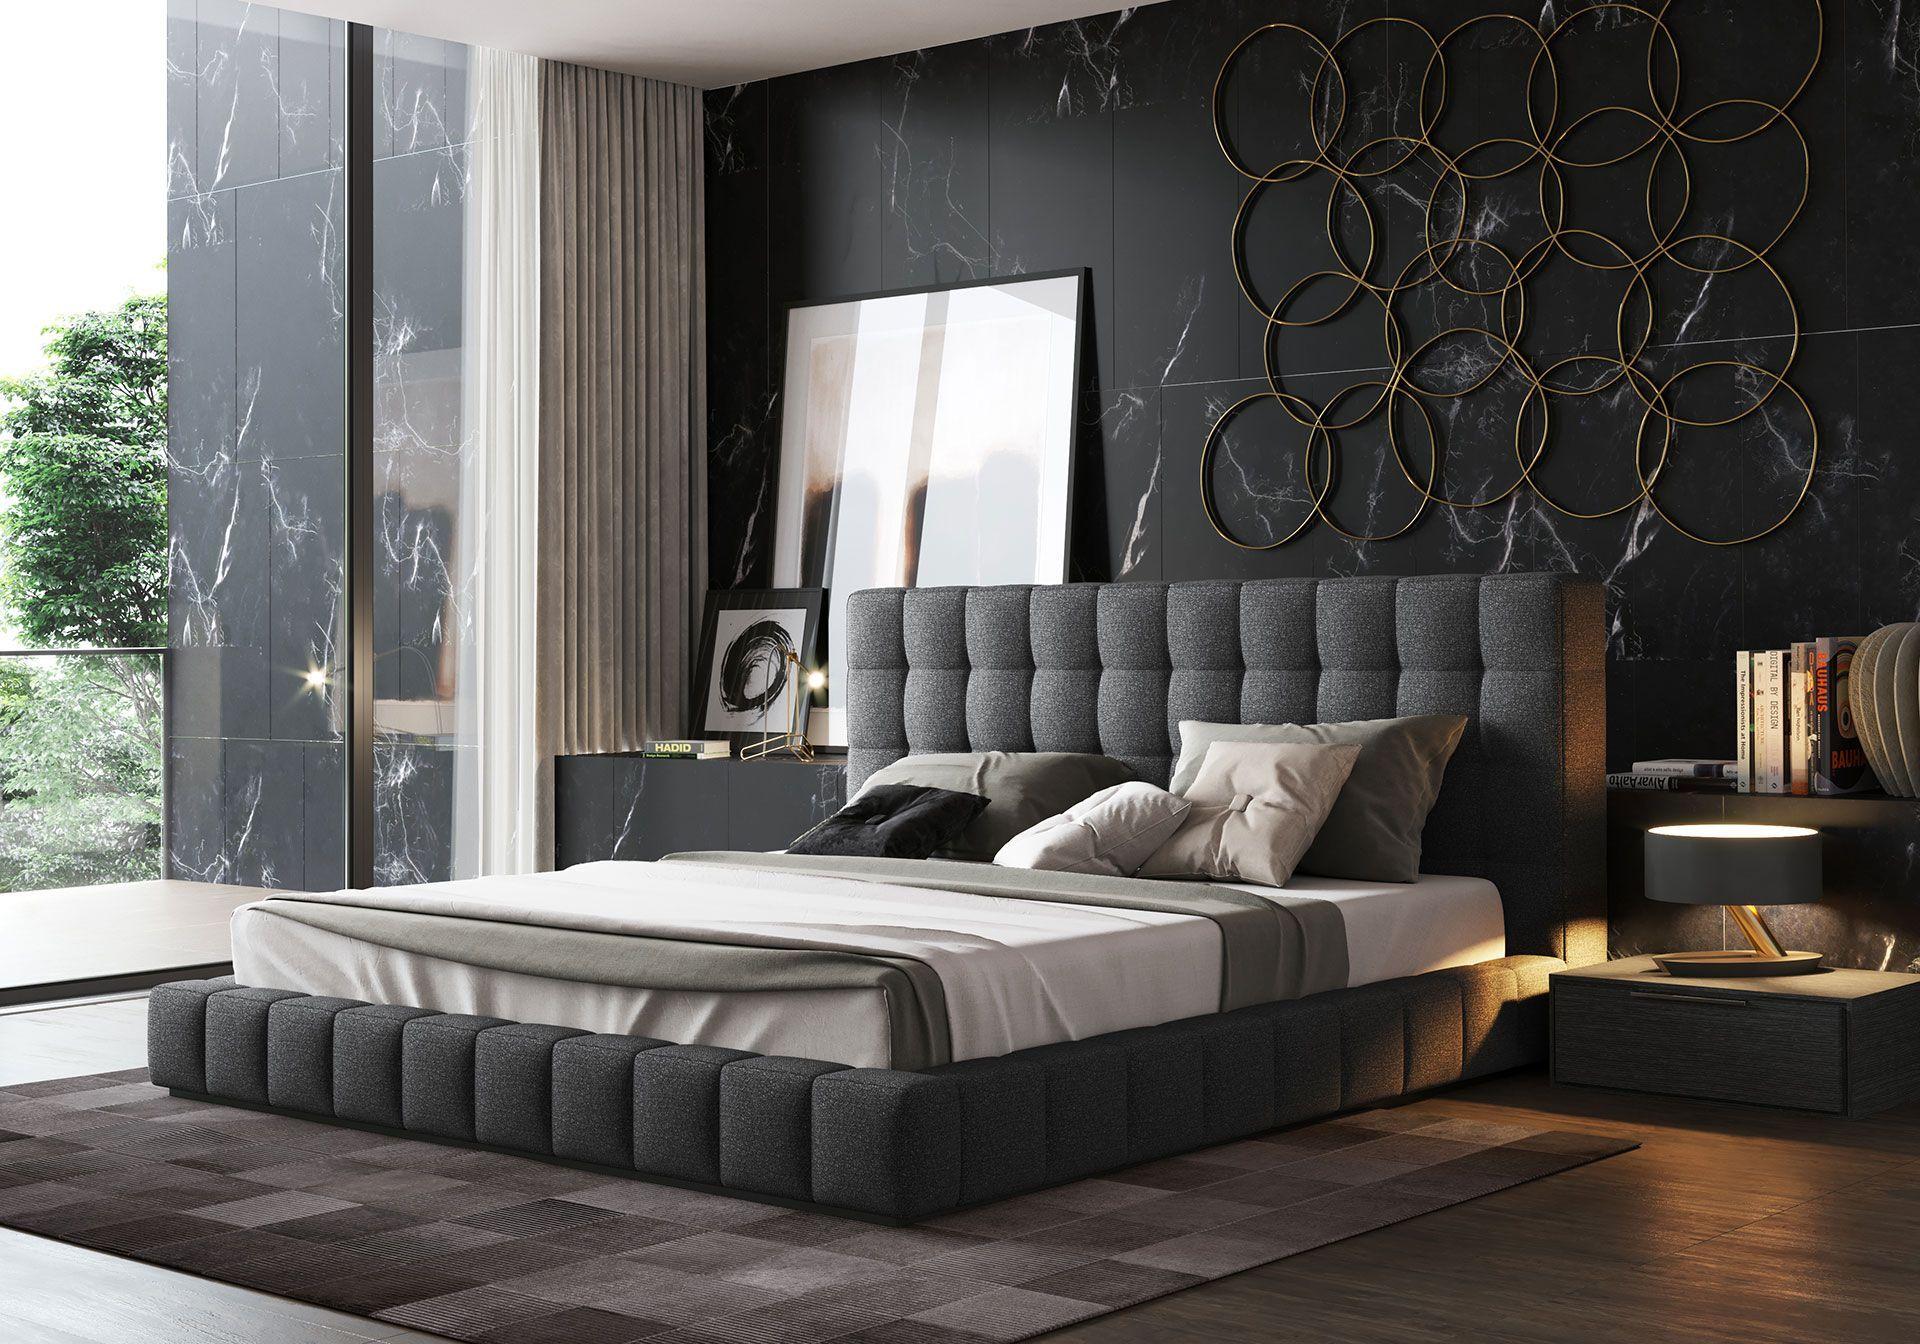 Modloft Thompson Queen Bed Md321 Q Official Store Luxurious